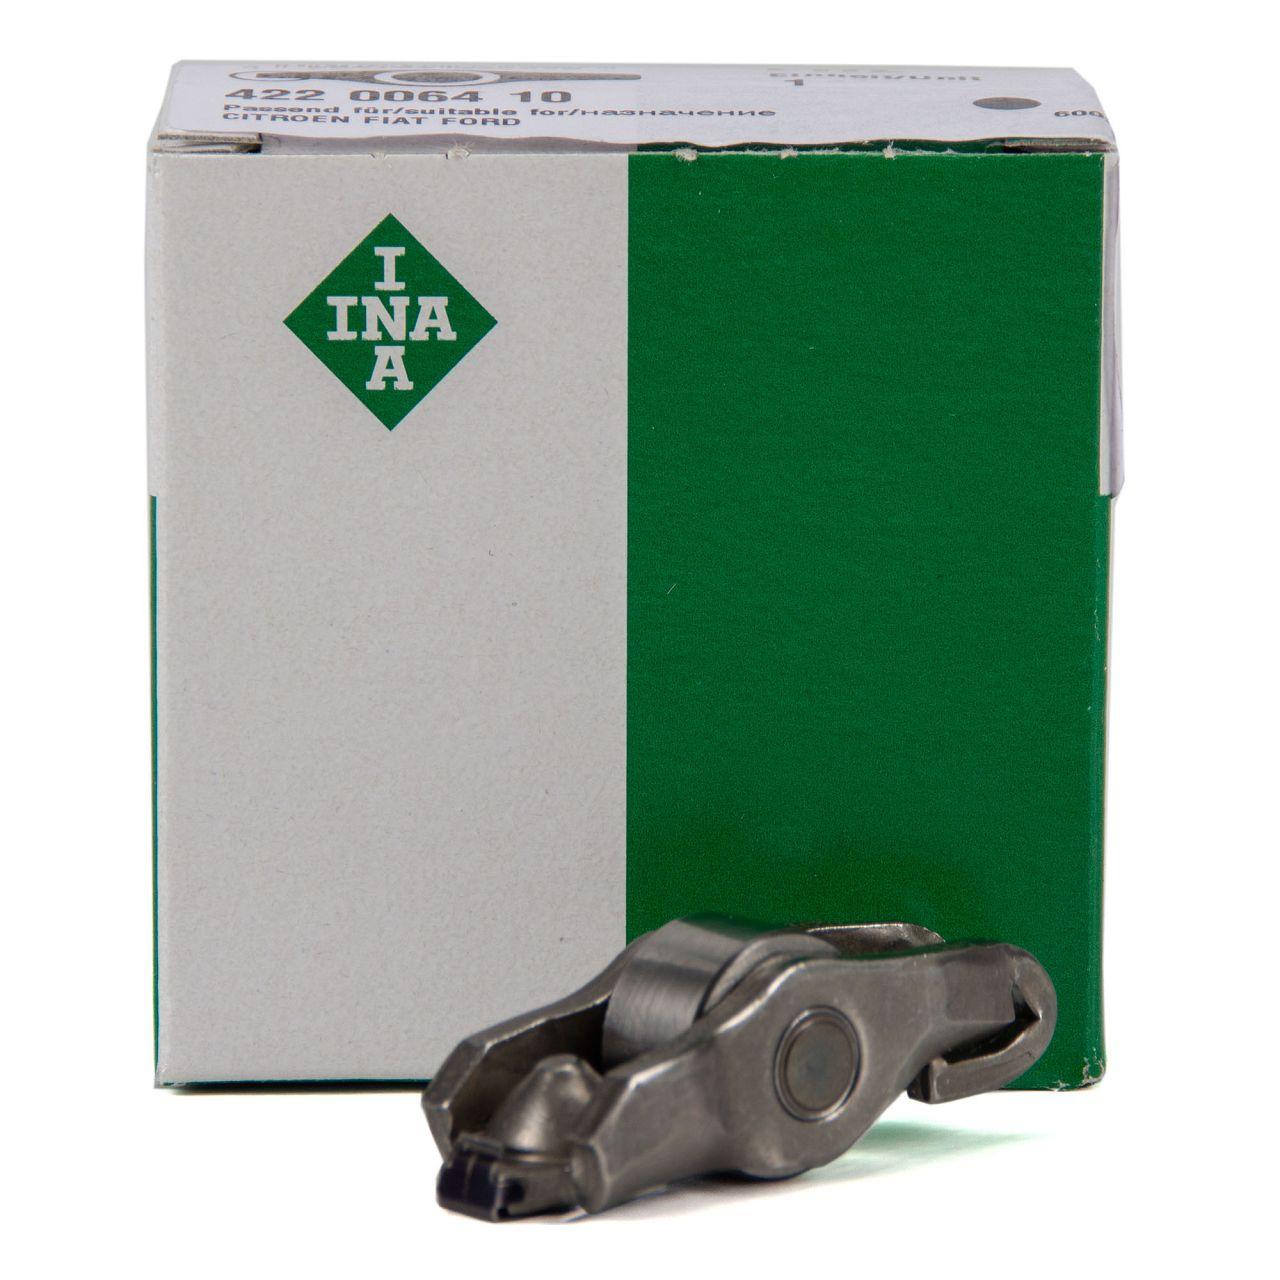 INA Kipphebel Schlepphebel für OPEL CORSA C D E FIAT TIPO 500 PANDA 1.3 DIESEL